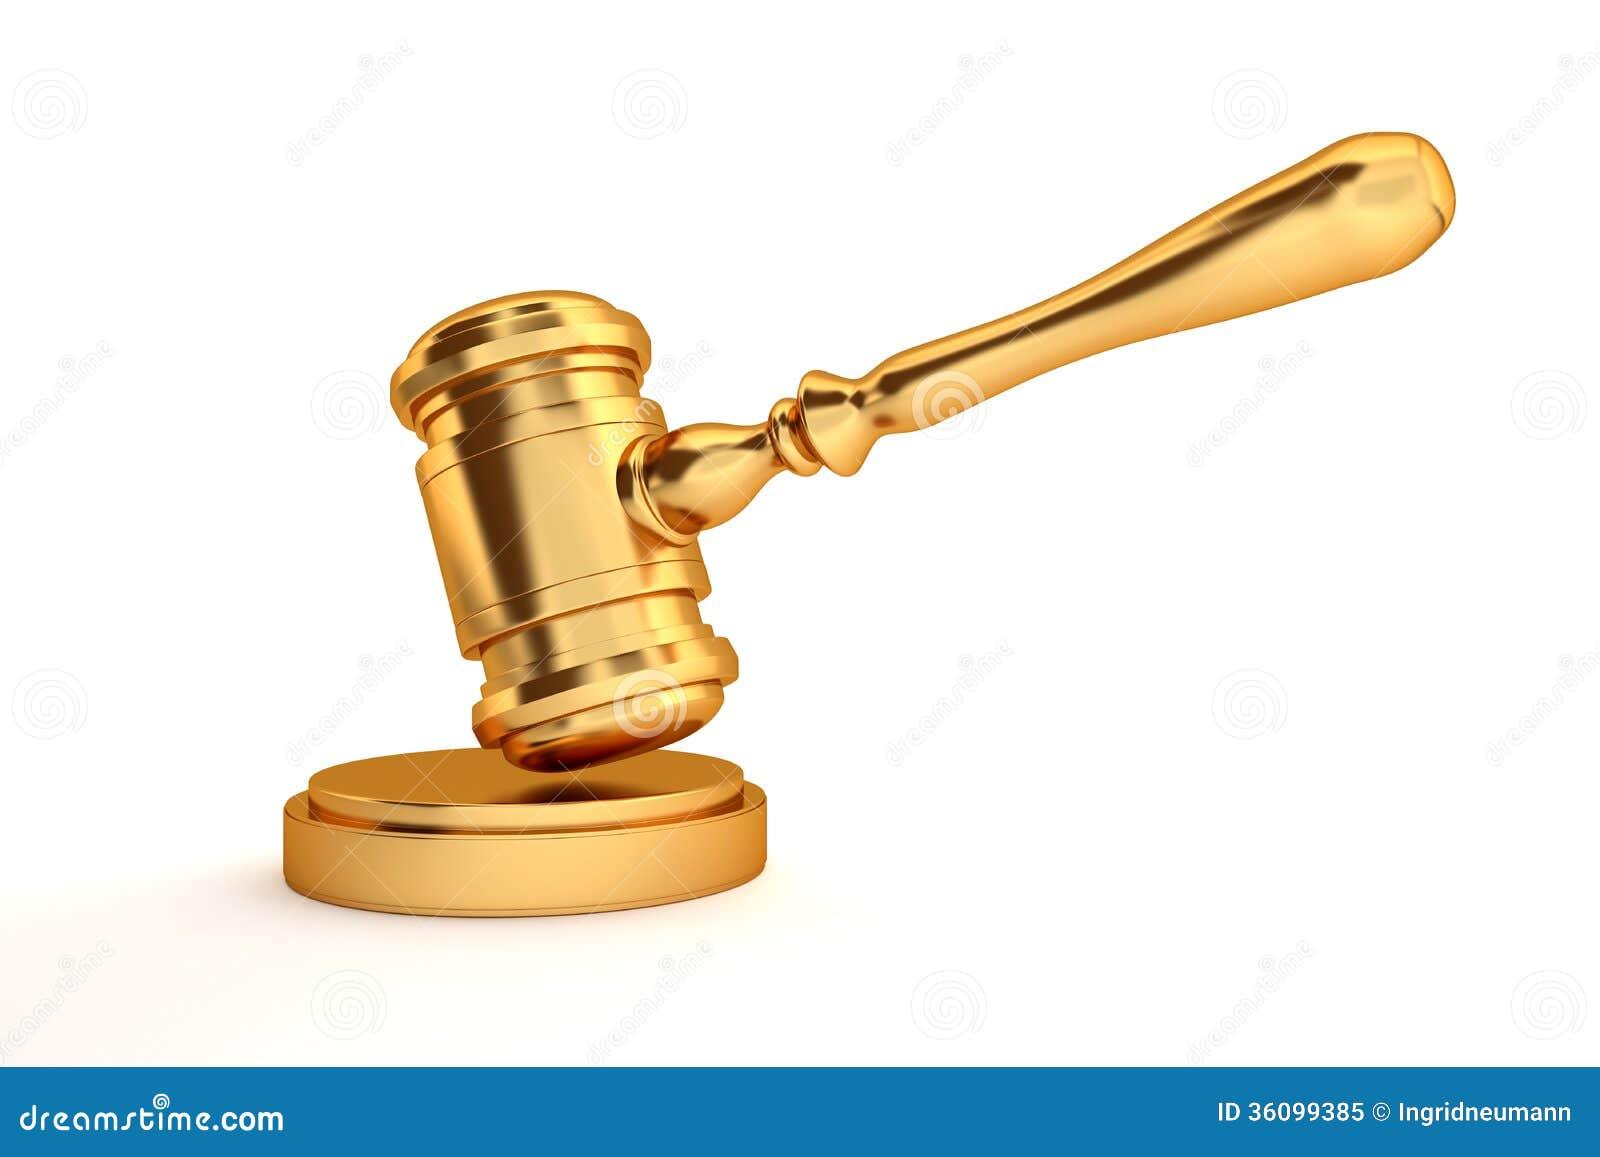 Gold Judge's Gavel Royalty Free Stock Photo - Image: 36099385